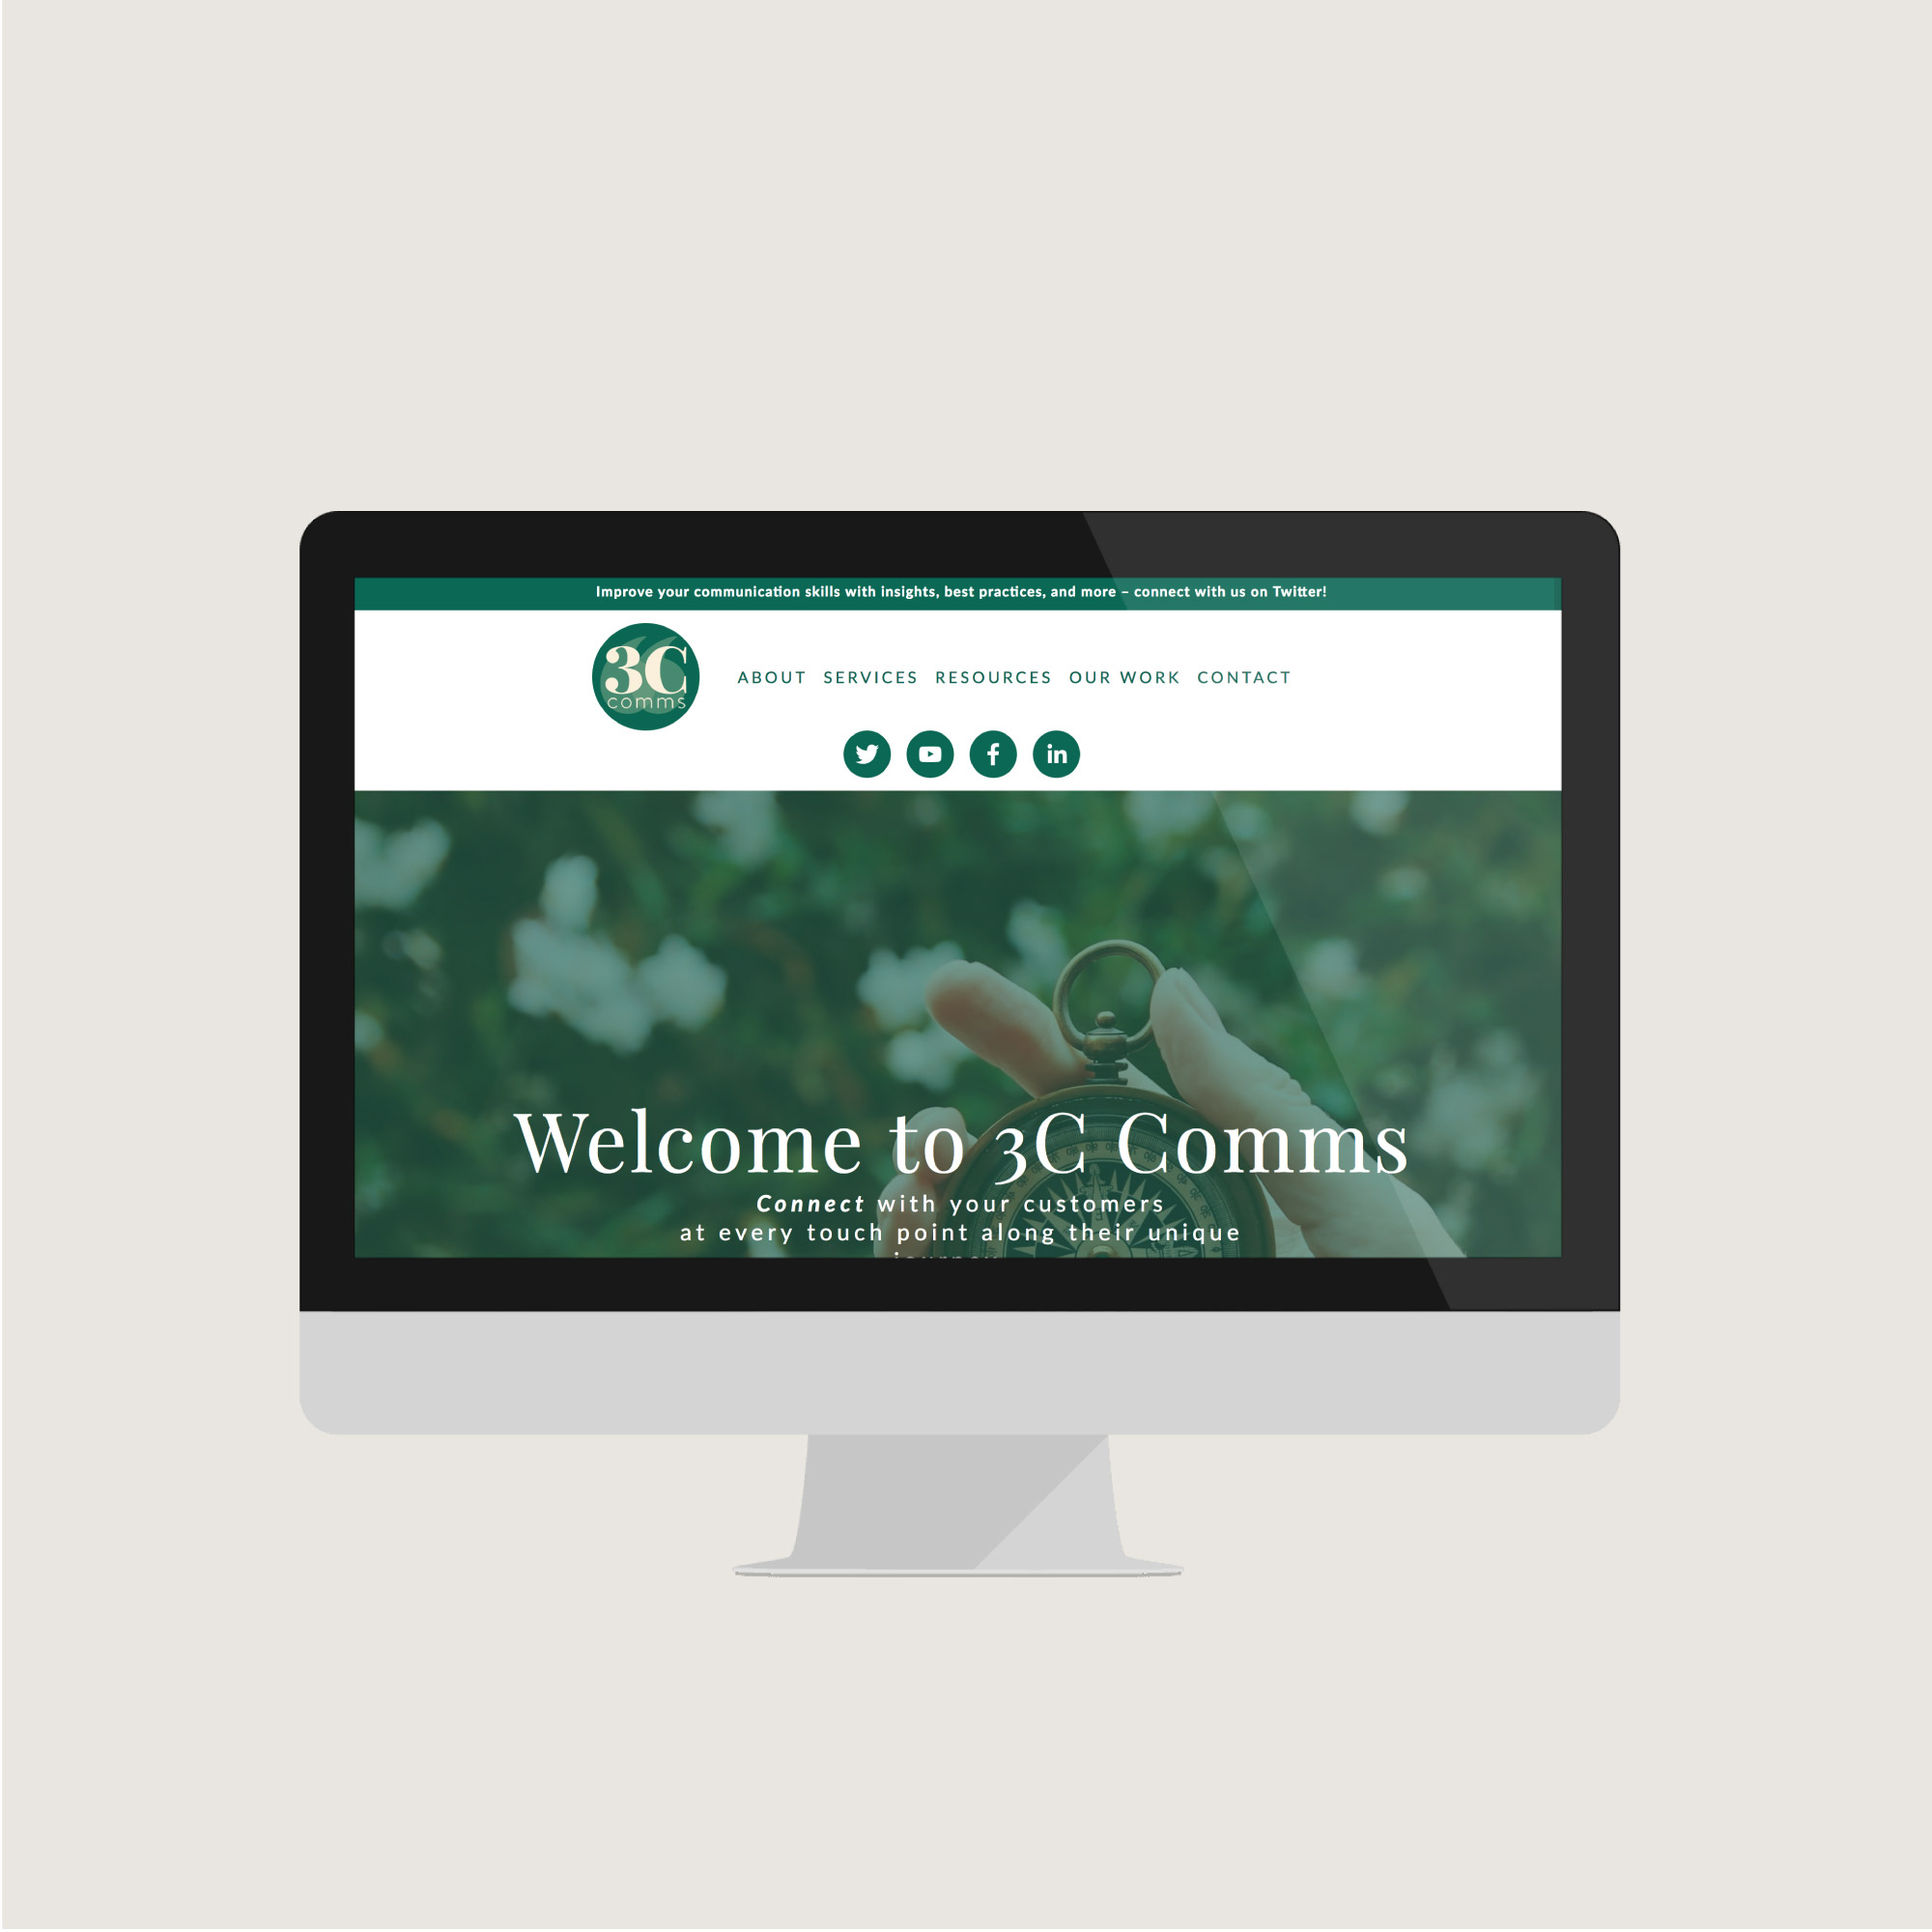 WebsiteDesignCommunicationsCompanySeattle1.jpg